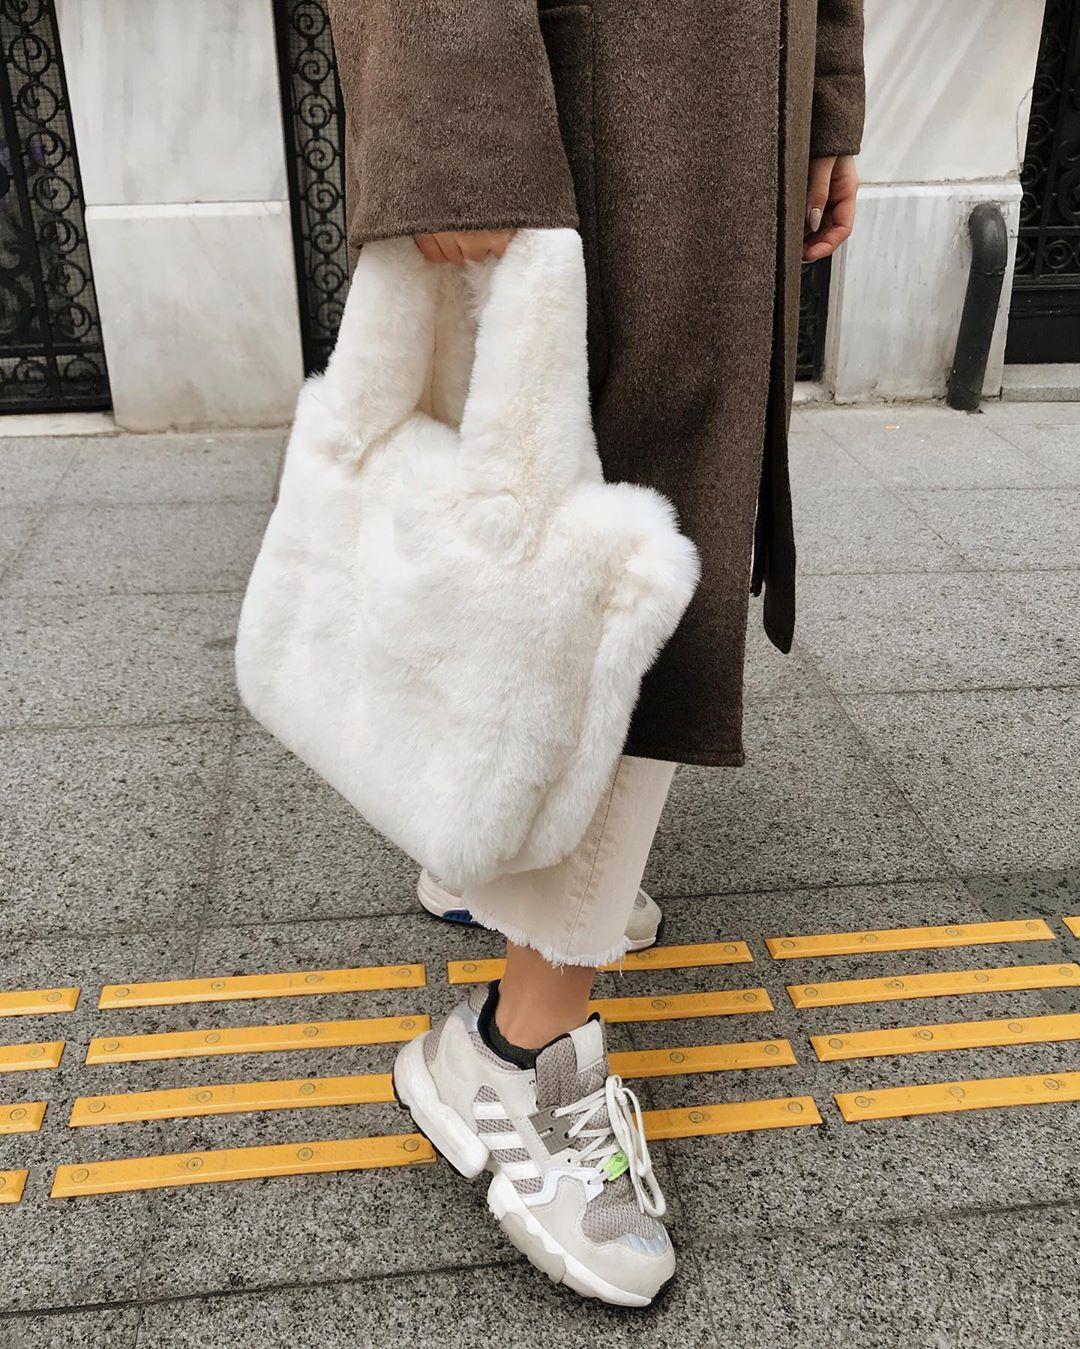 coat with patch pockets de Zara sur oykuozguler